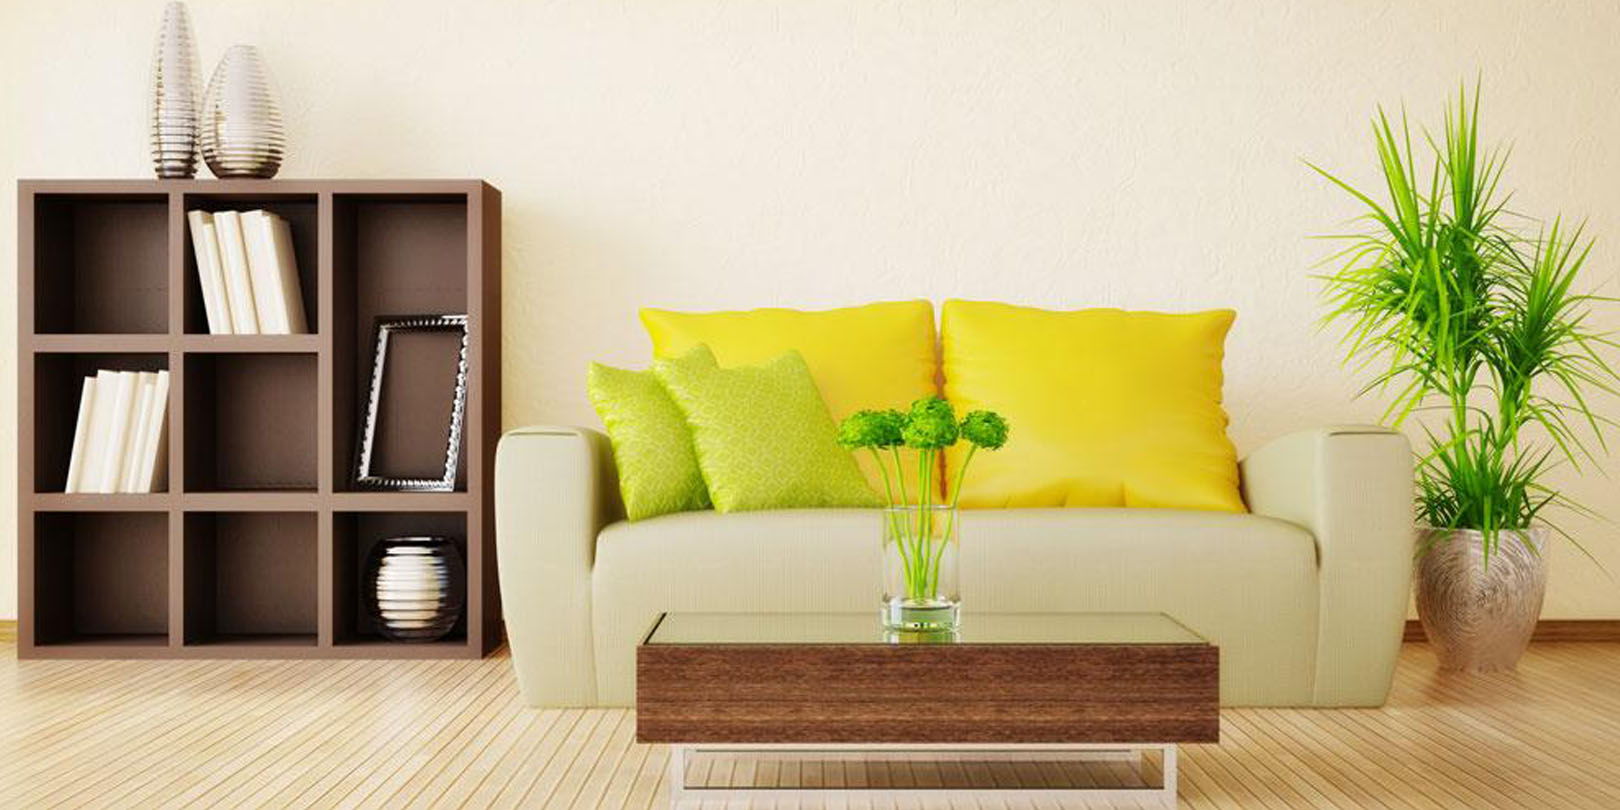 Top 10 Furniture Shops In Noida, Furniture market in Noida